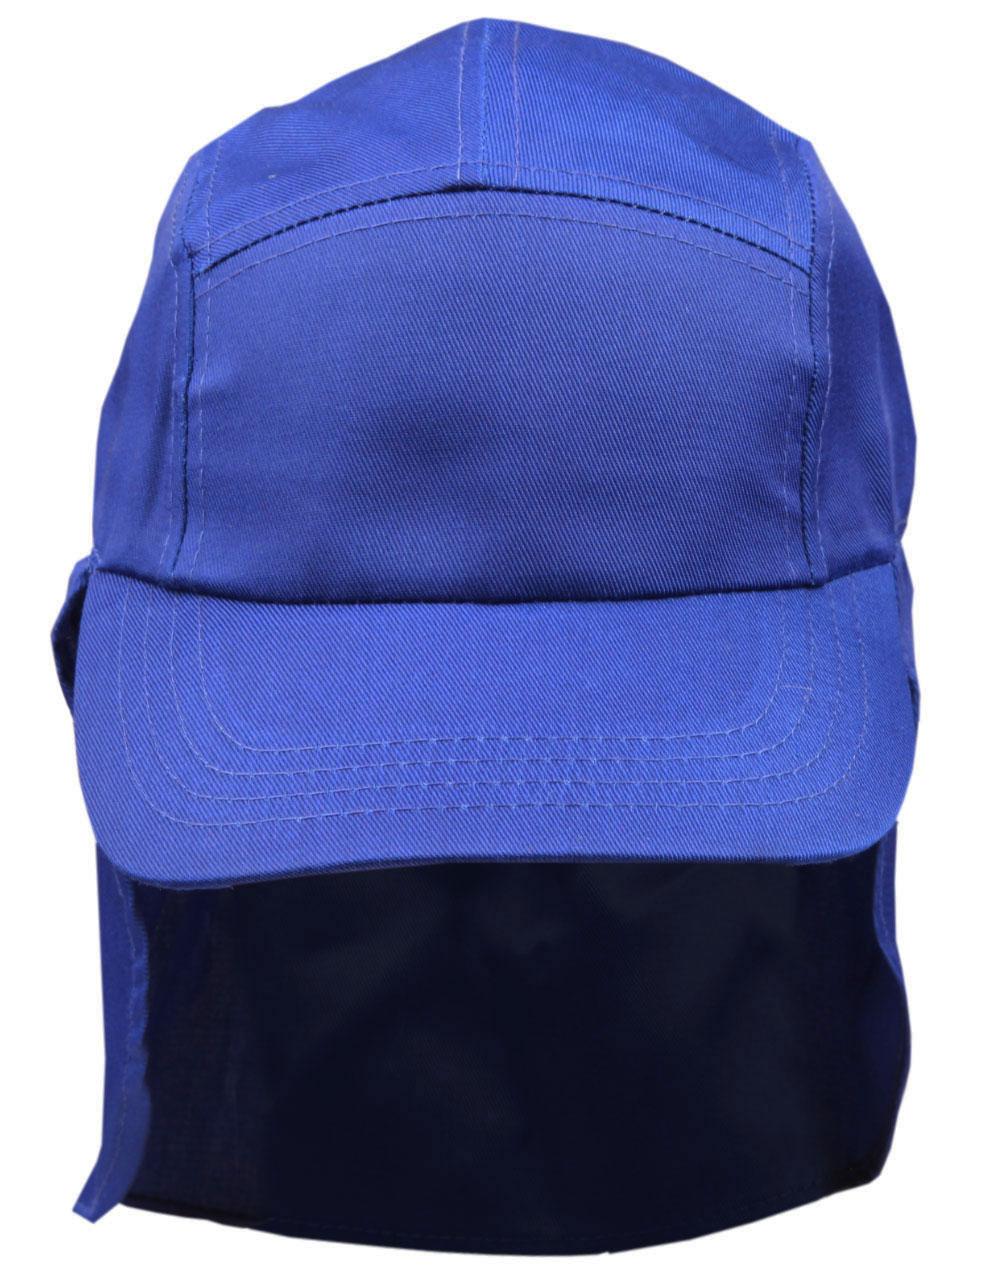 5806a5e2e8e Custom Hats and Caps- CH25 Custom Children s Legionnaire Custom Hat